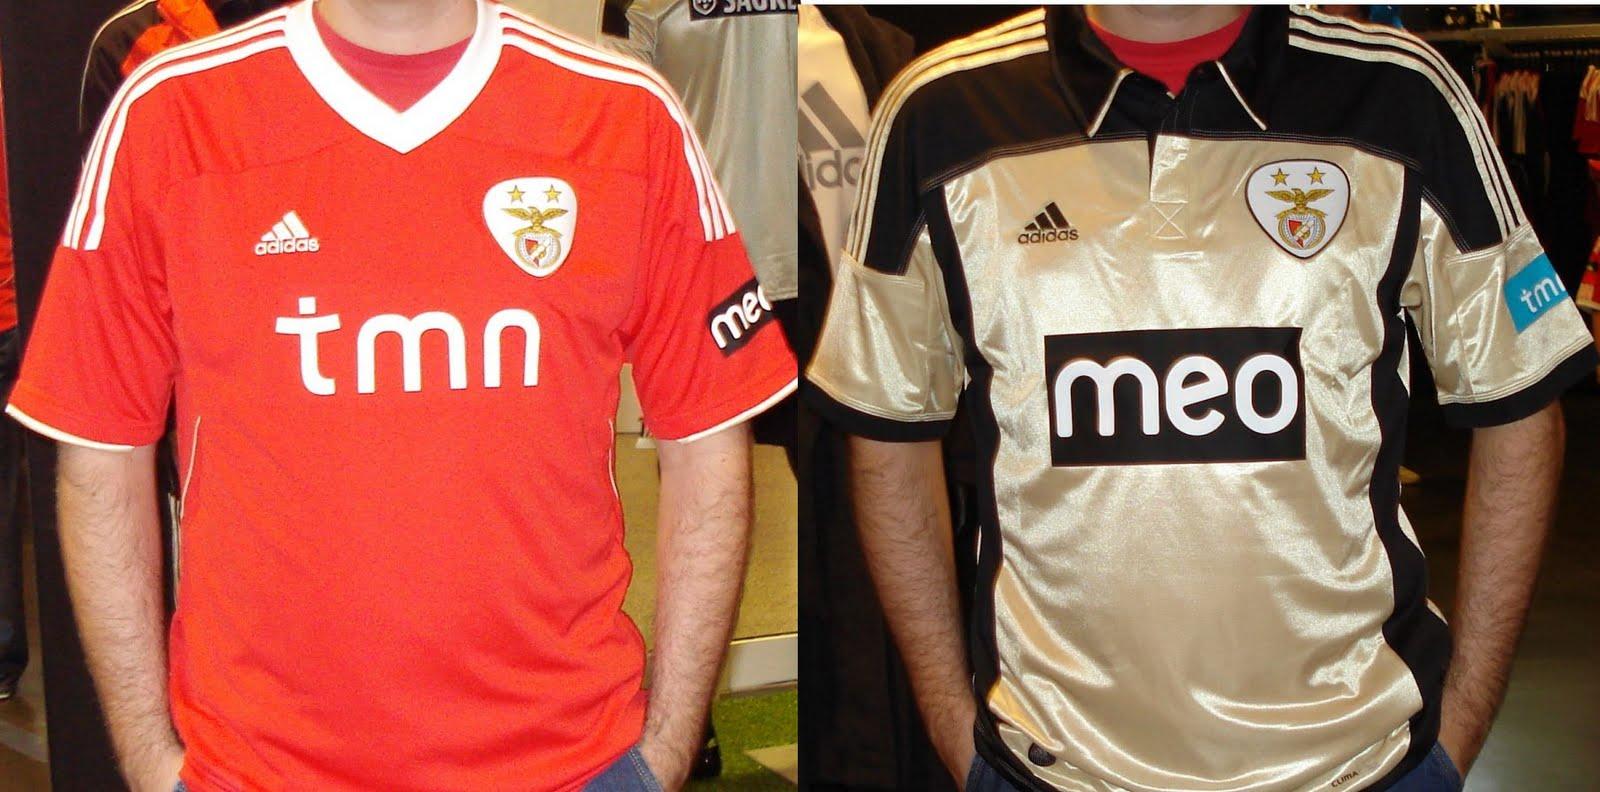 a45fcadc7 Será esta a nova camisola oficial do Benfica para a temporada 2011 2012. A  camisola fabricada pela Adidas